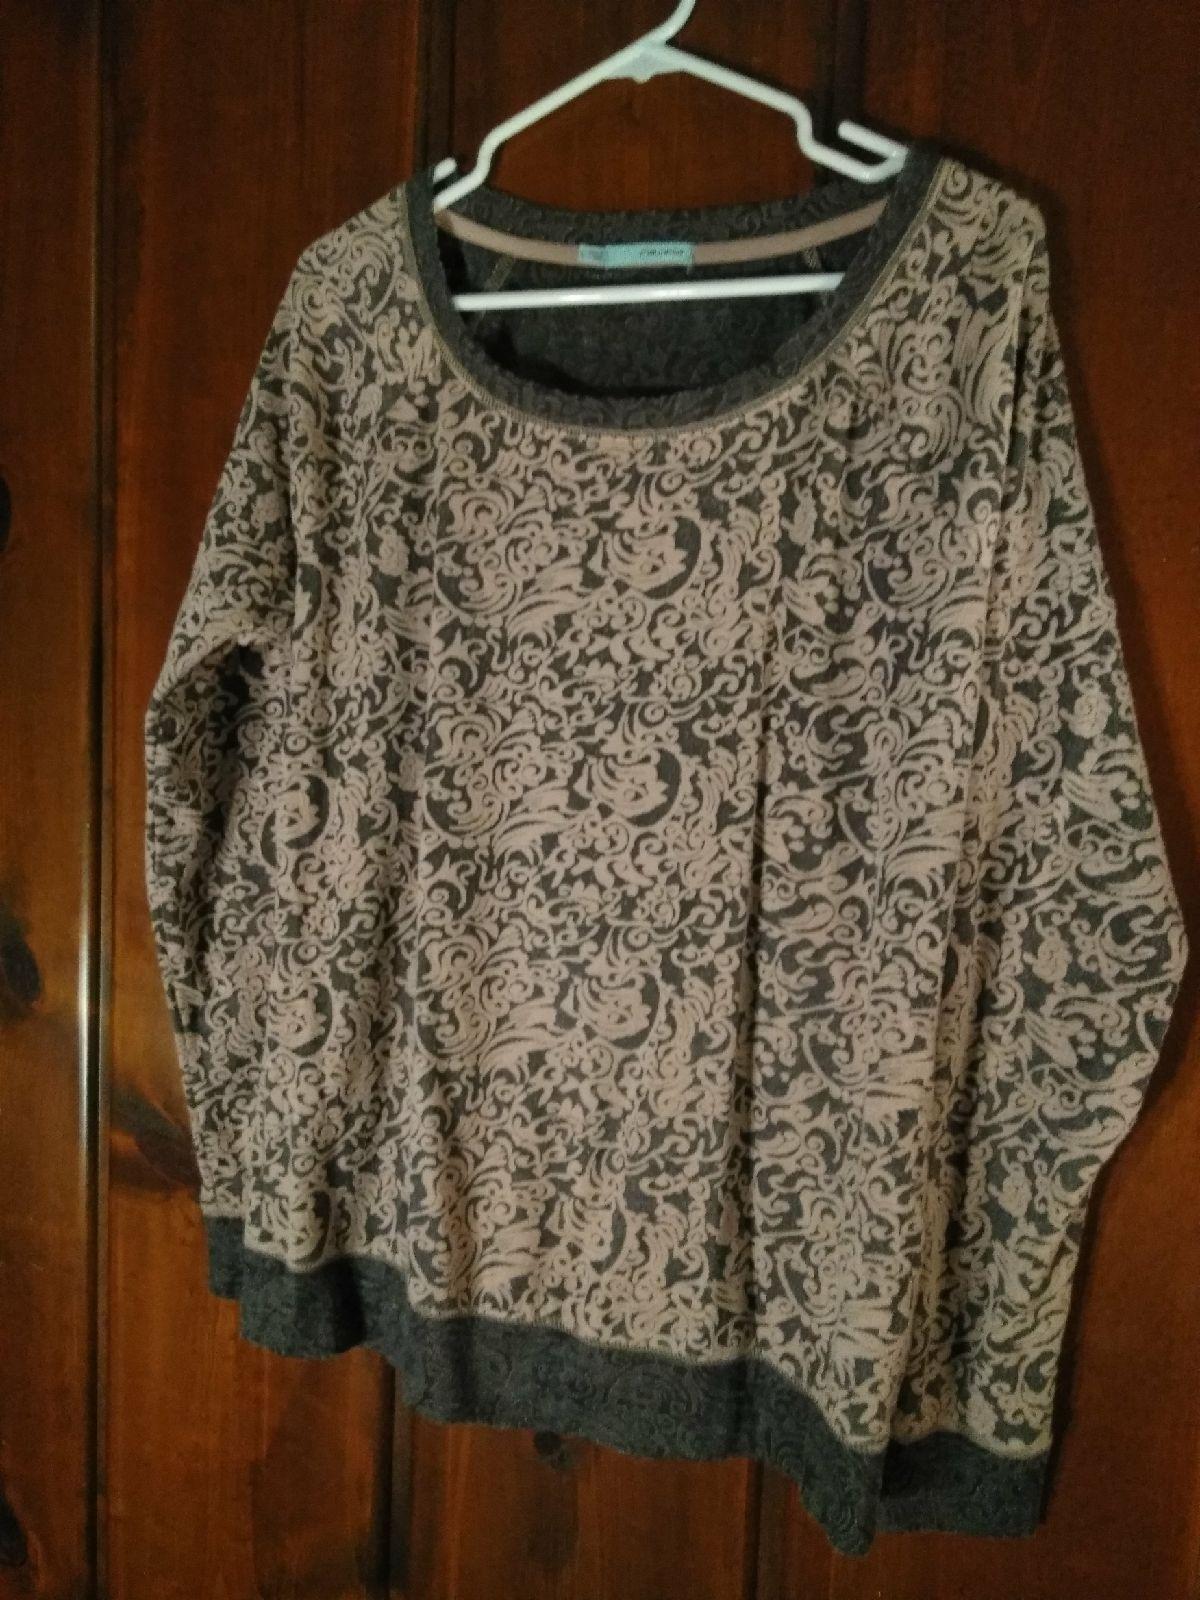 Grey pink sweater/top - Mercari: BUY & SELL THINGS YOU LOVE